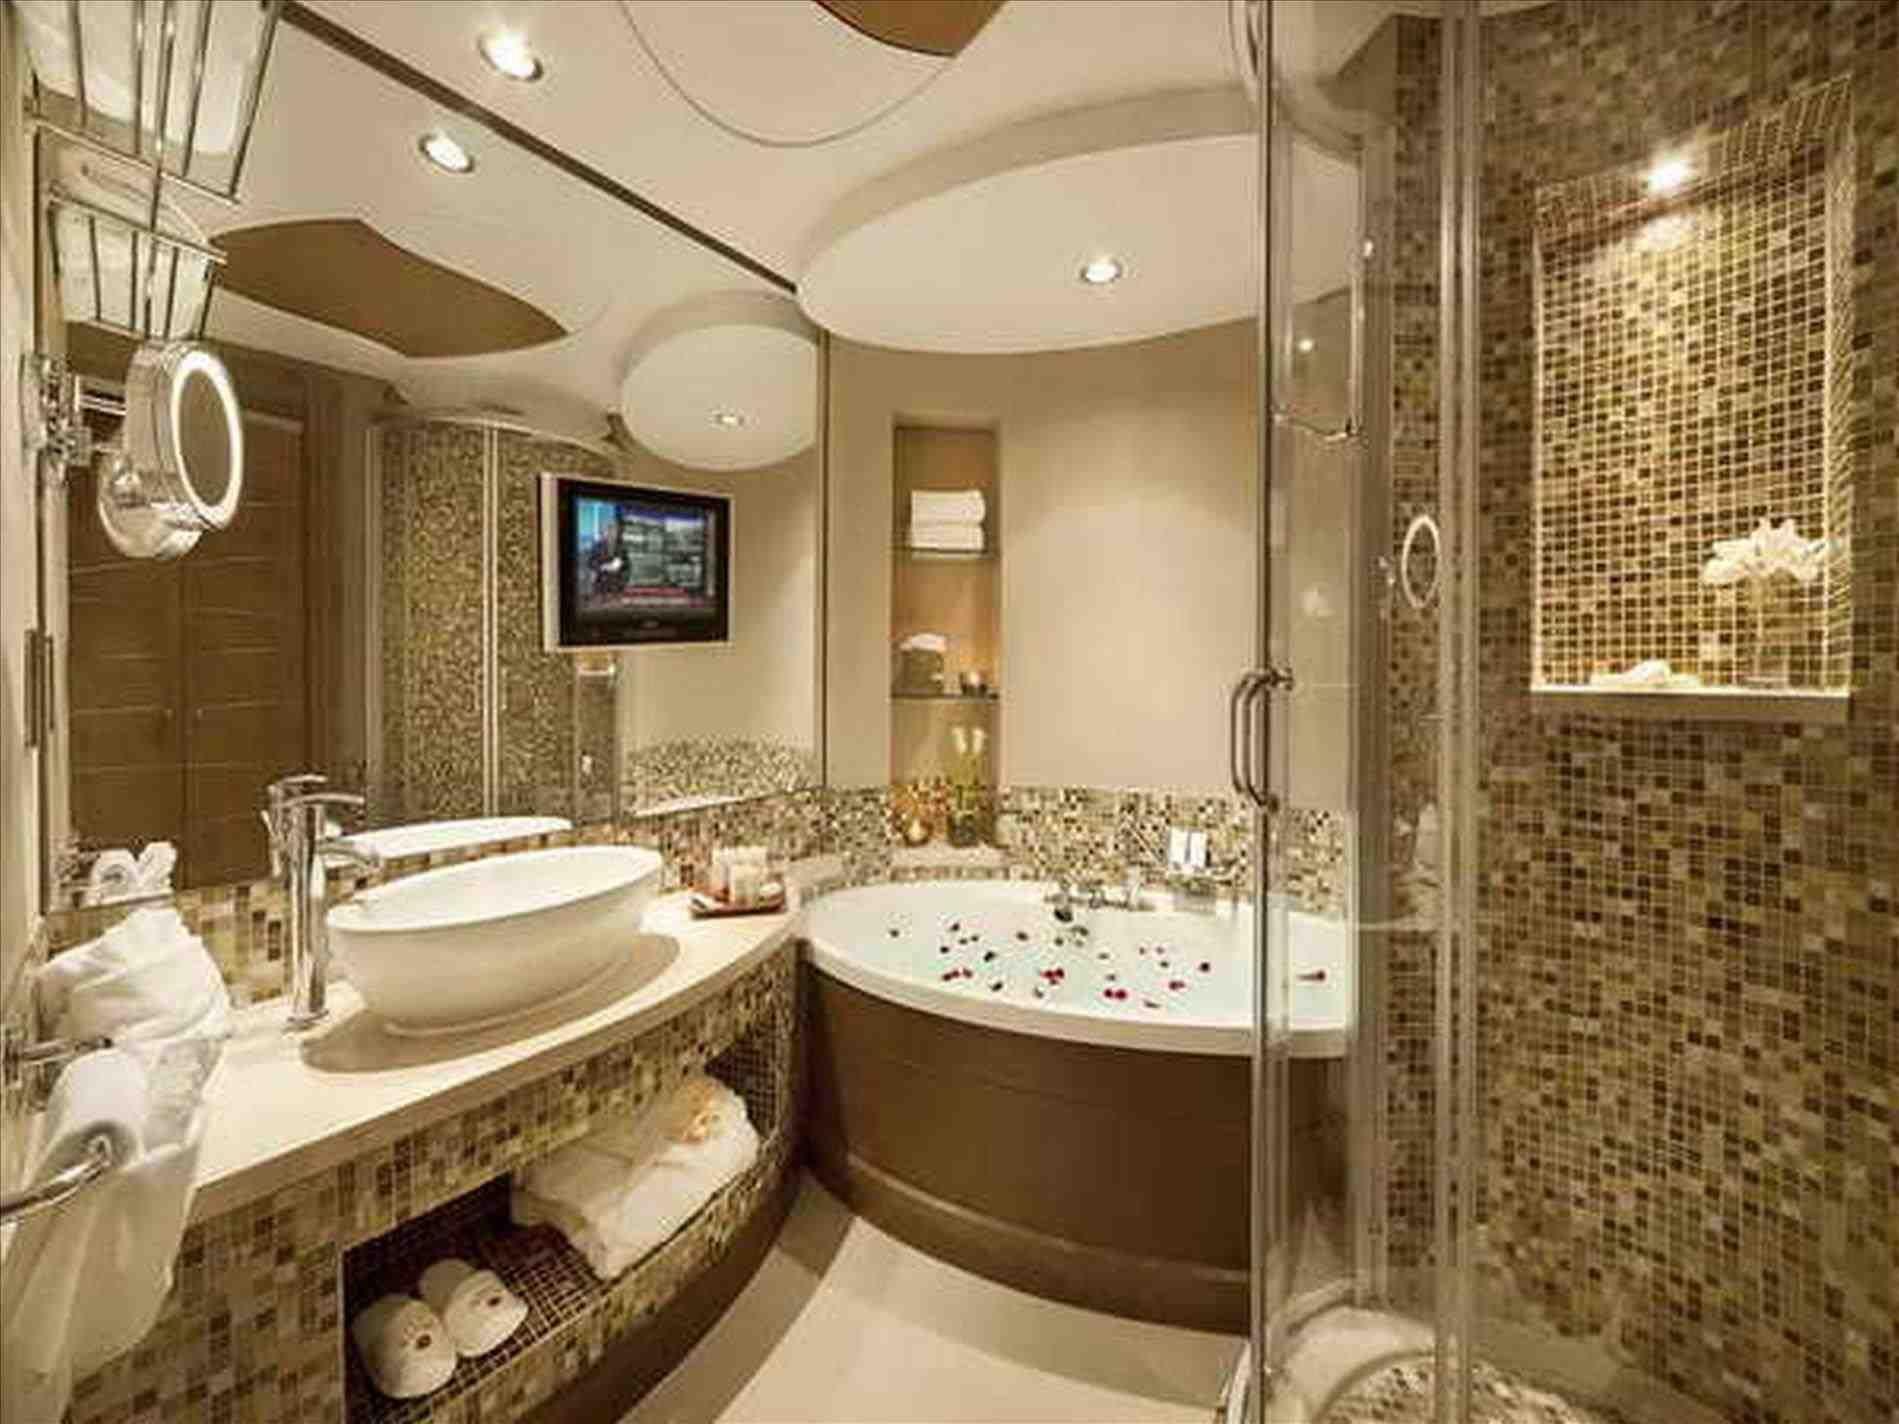 simple apartment bathroom decorating ideas. This Black And Gold Bathroom Ideas Apartment - Simple-apartment-bathroom- Decorating-ideas. Awesome Accessories White Inovesia Home Car Simple Decorating E